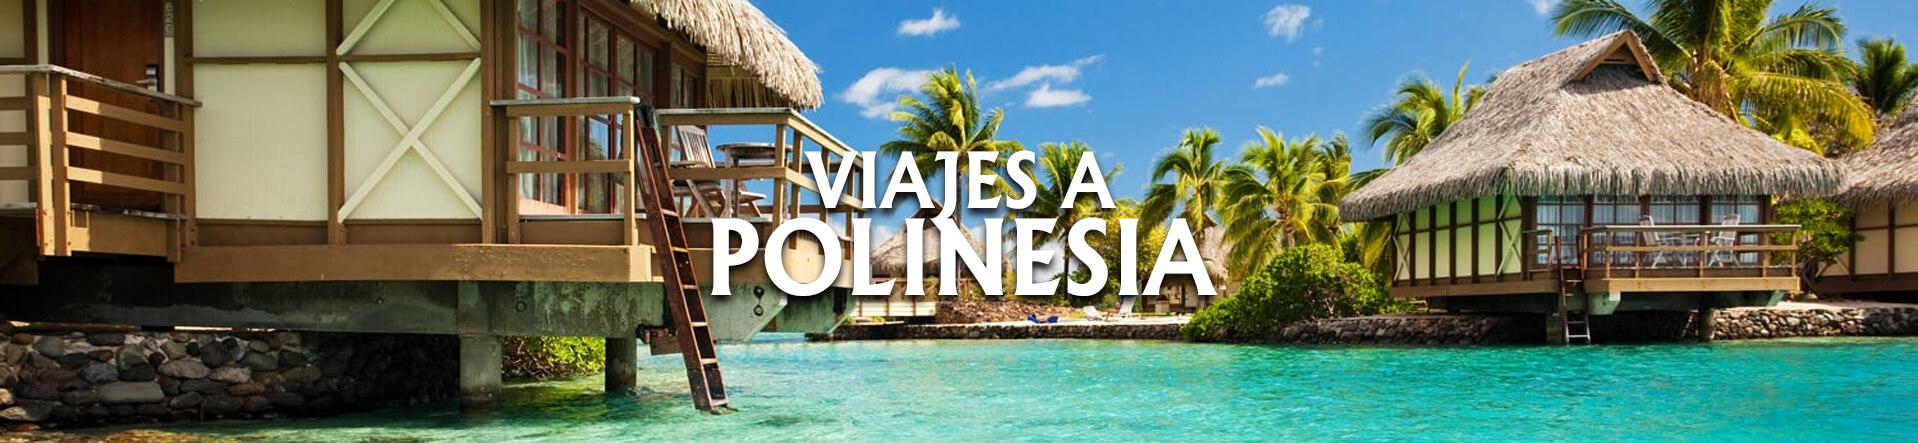 Polinesia desde Argentina